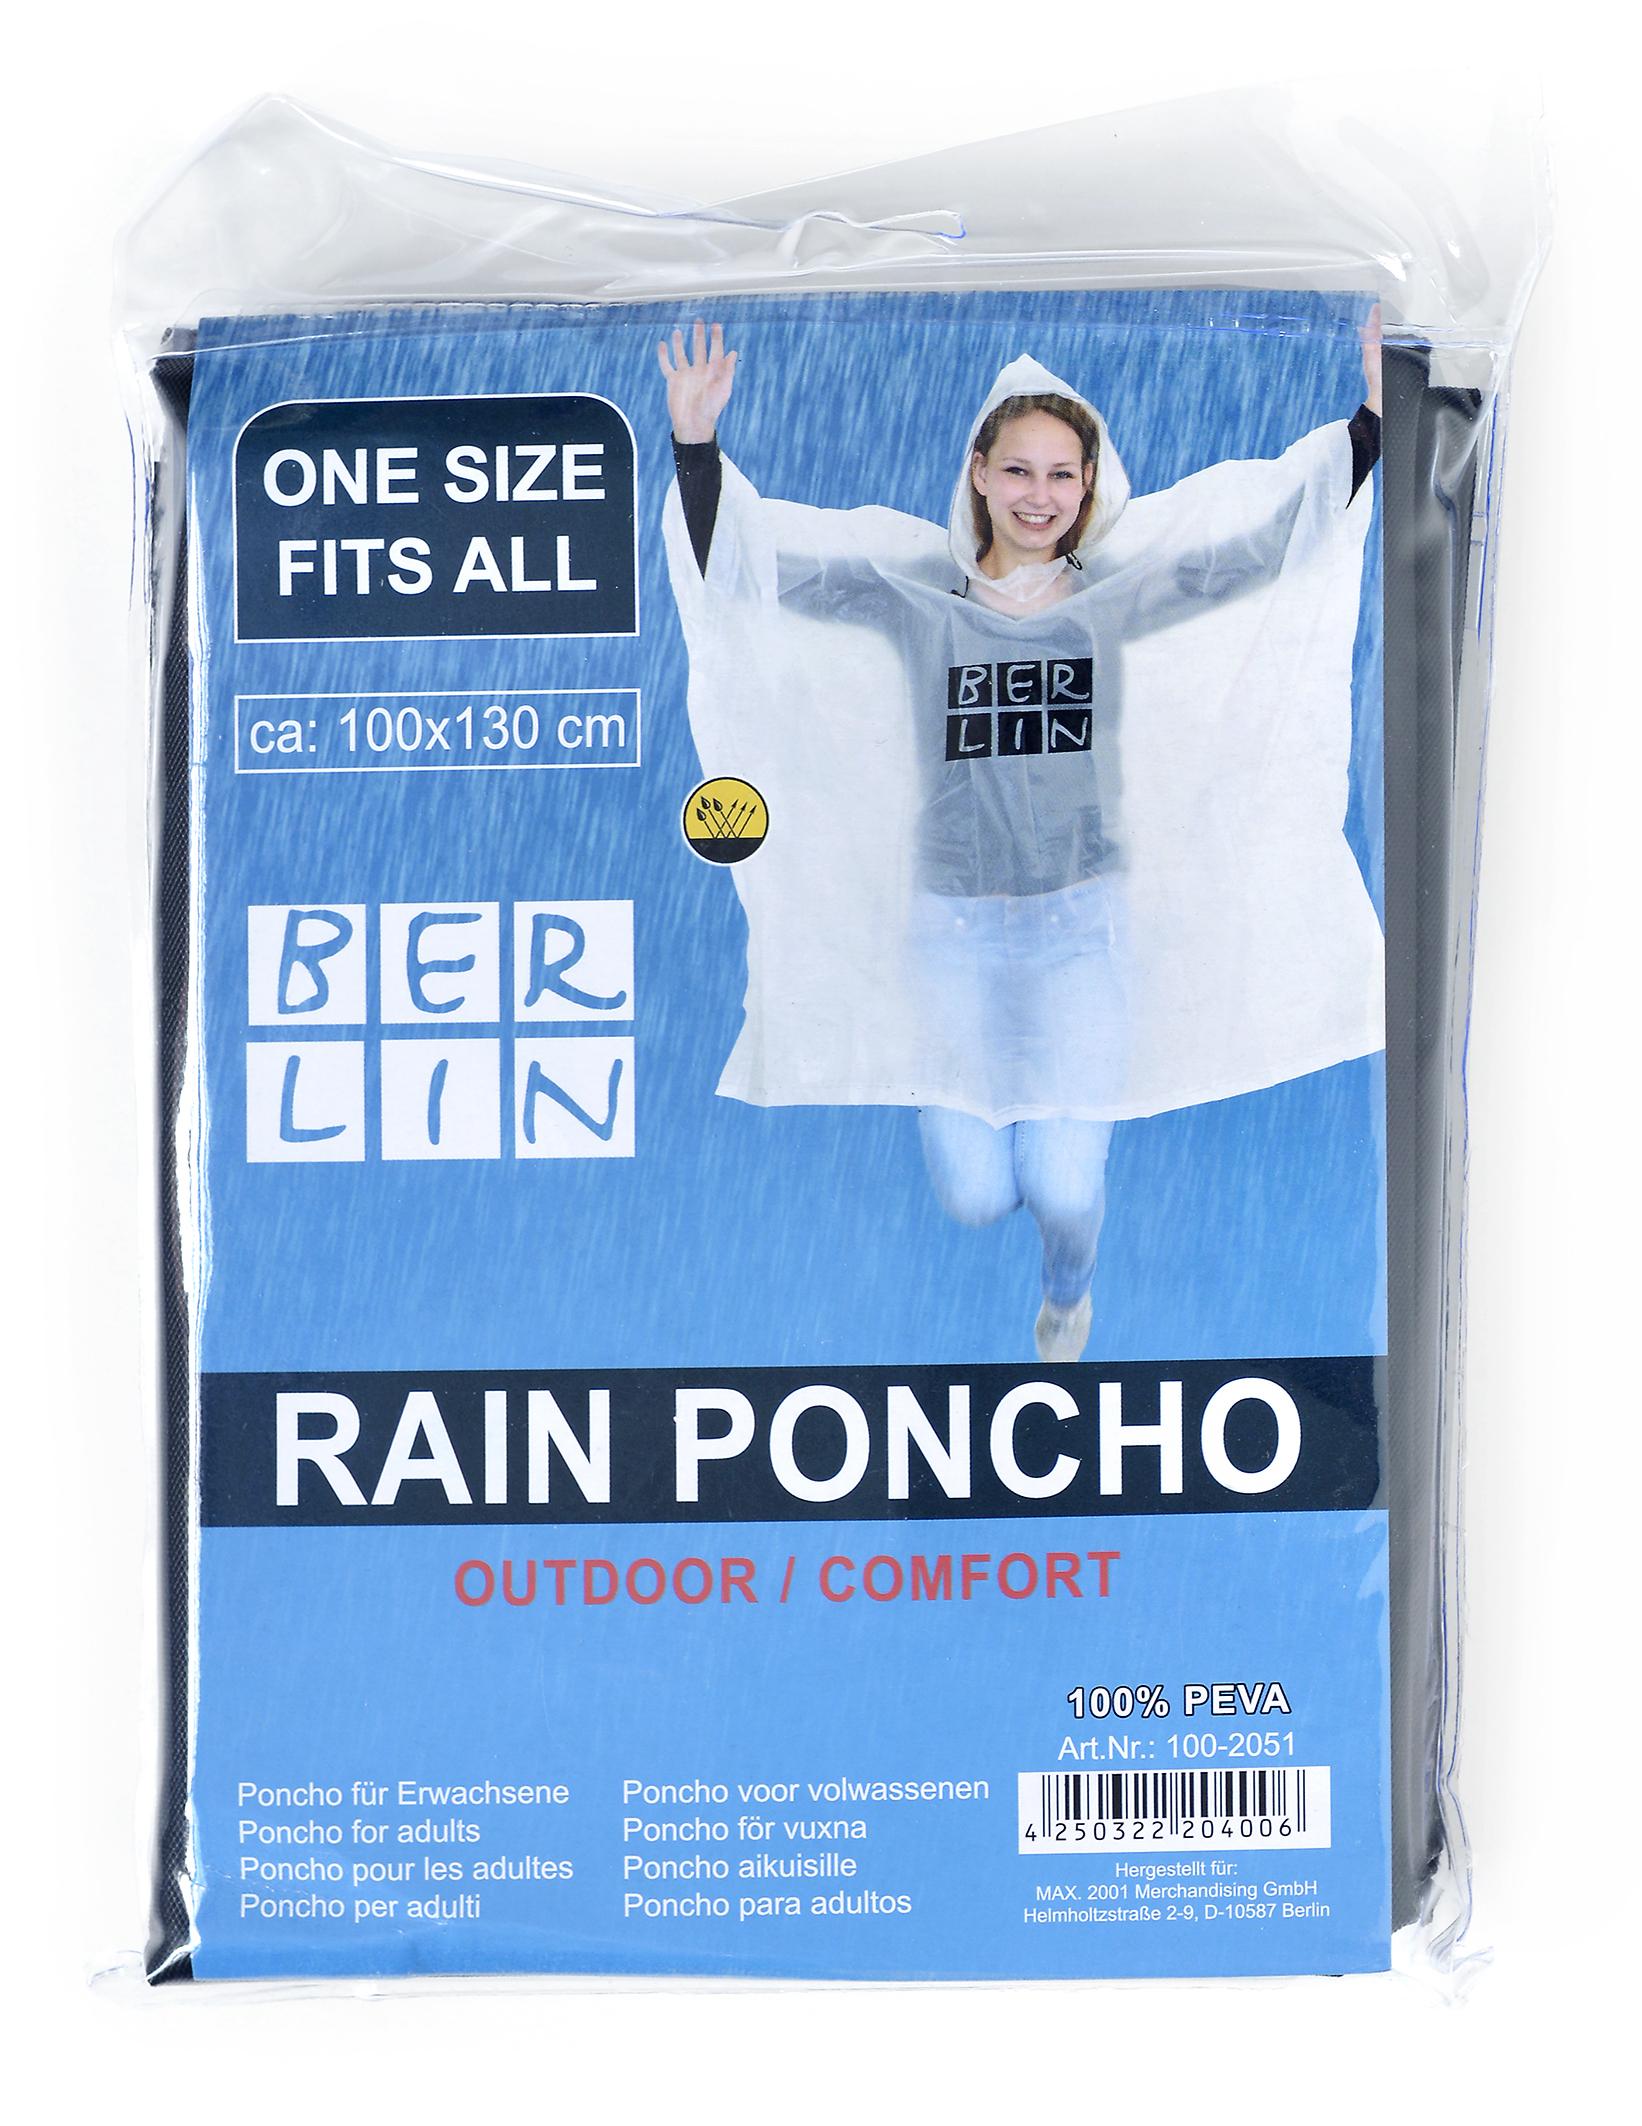 100-2051_Rain_Poncho_2018